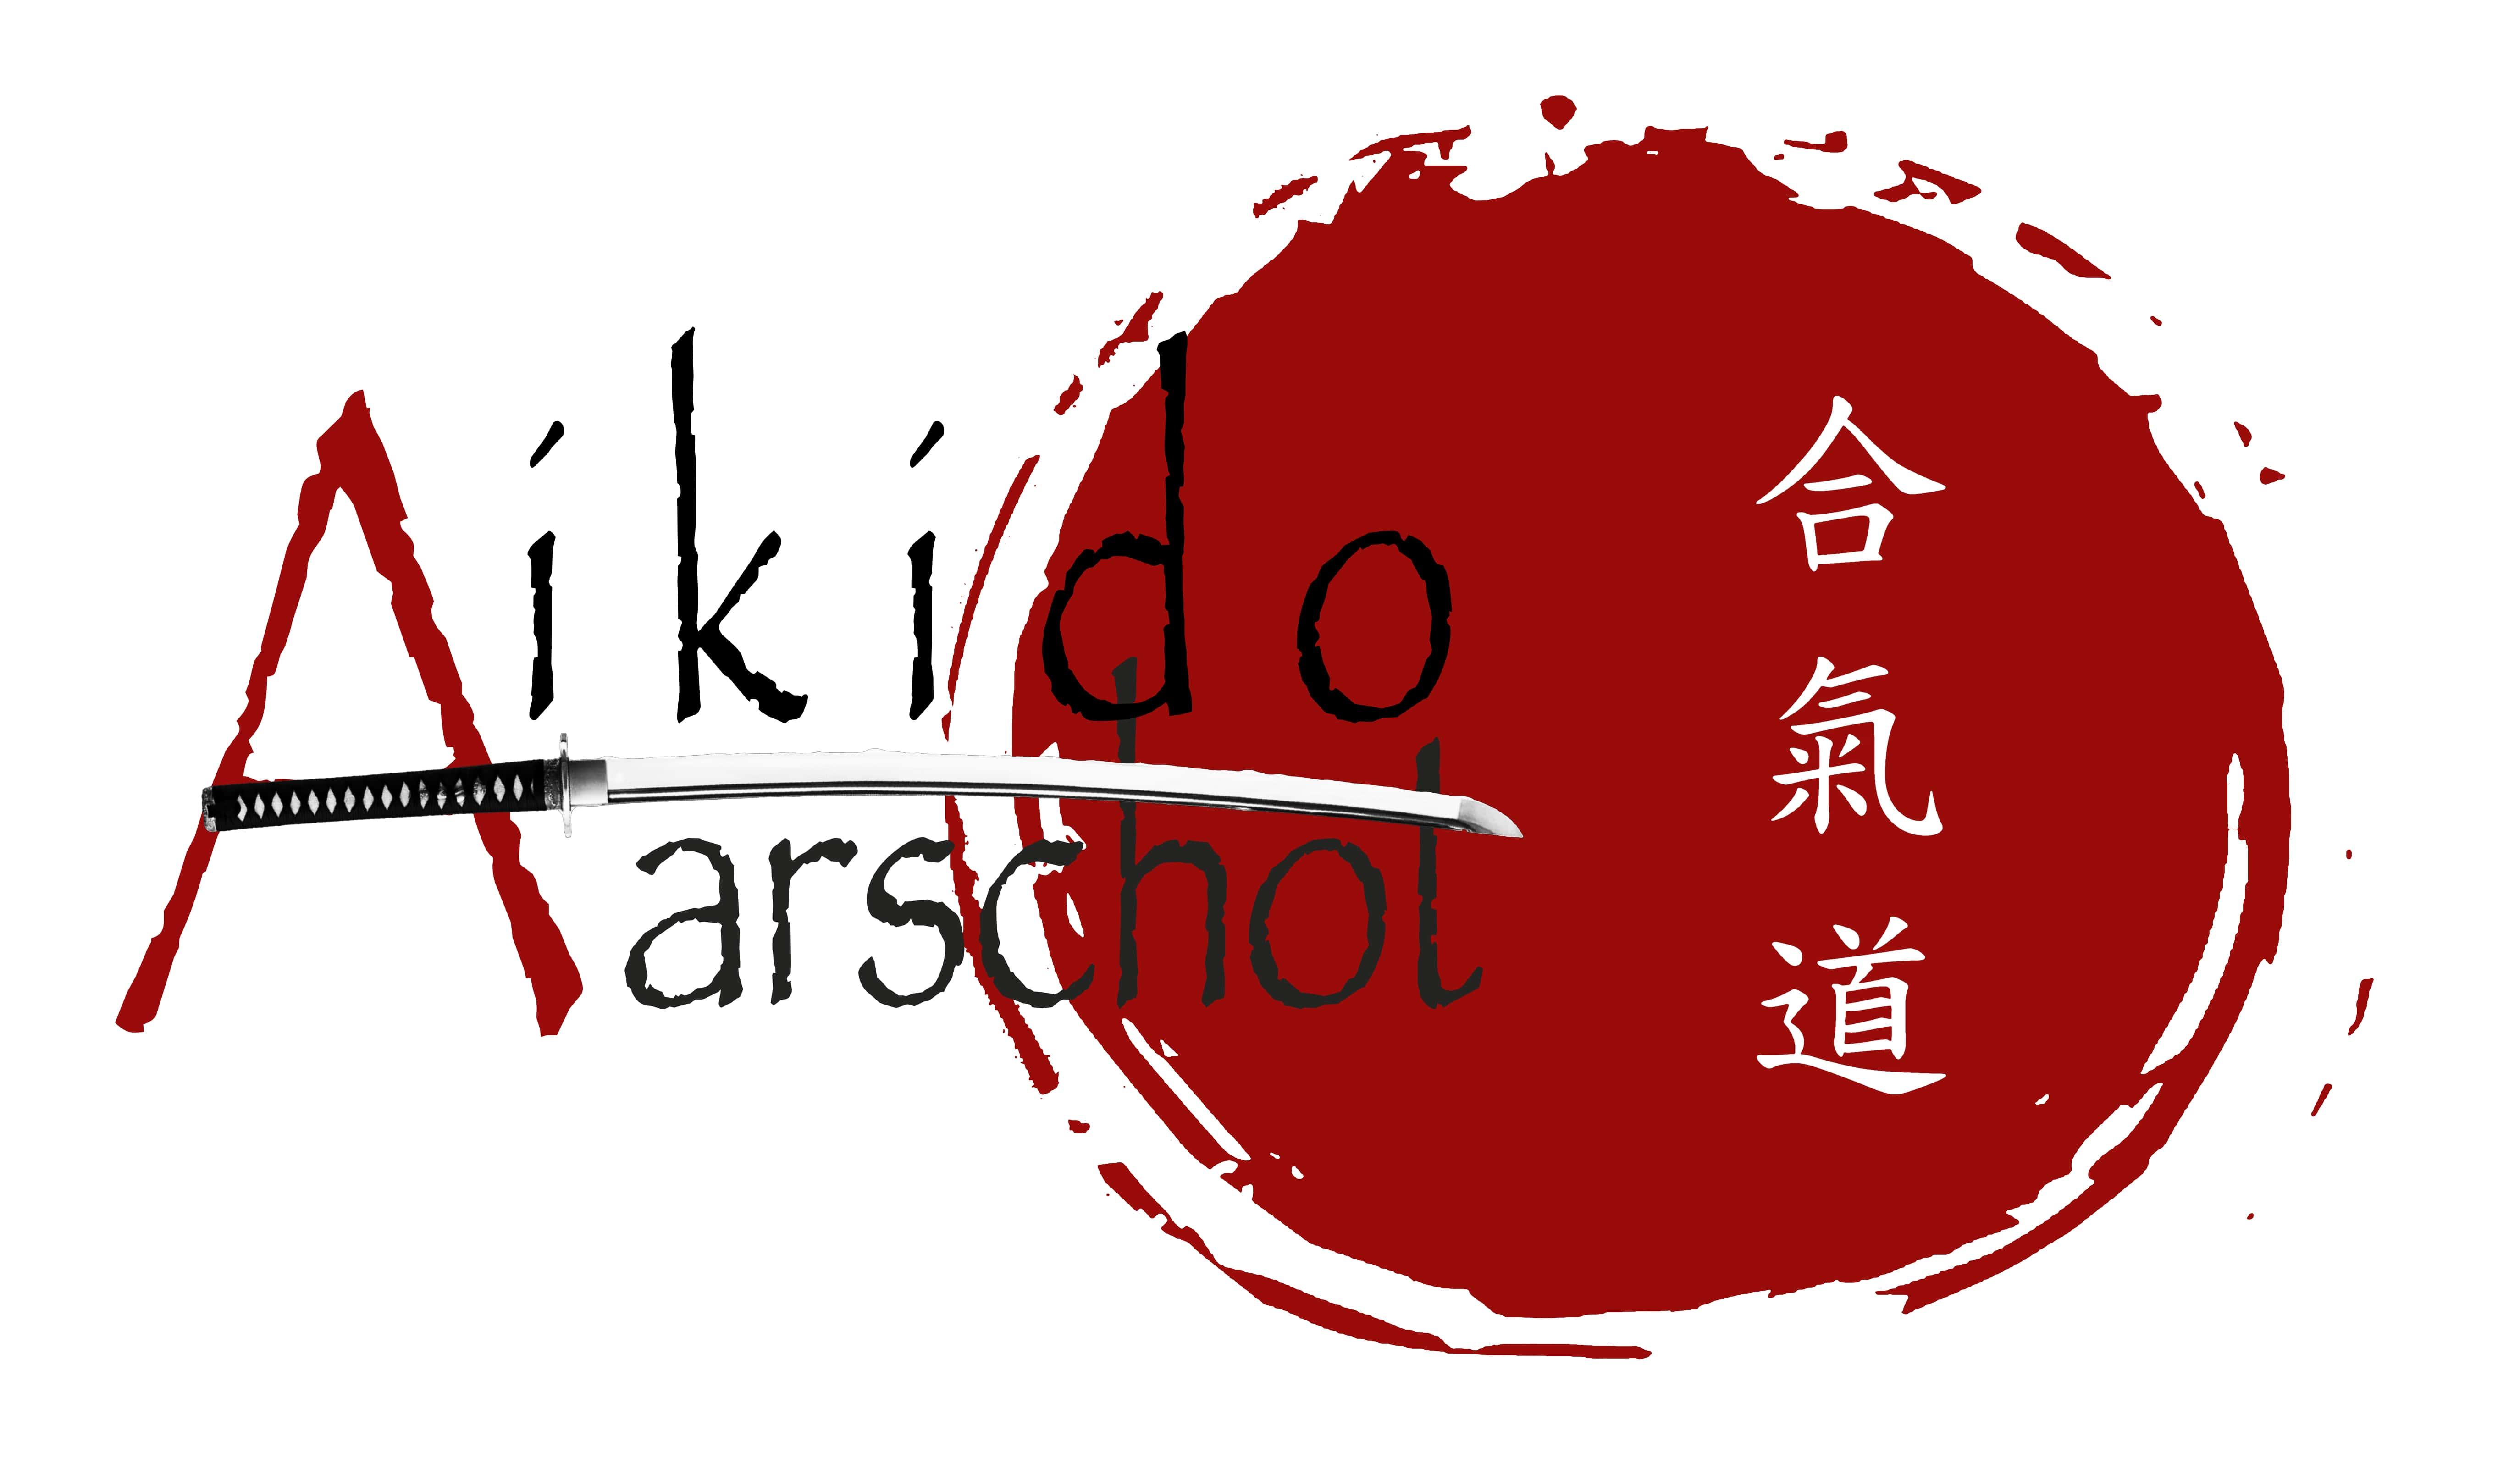 Aikido Aarschot